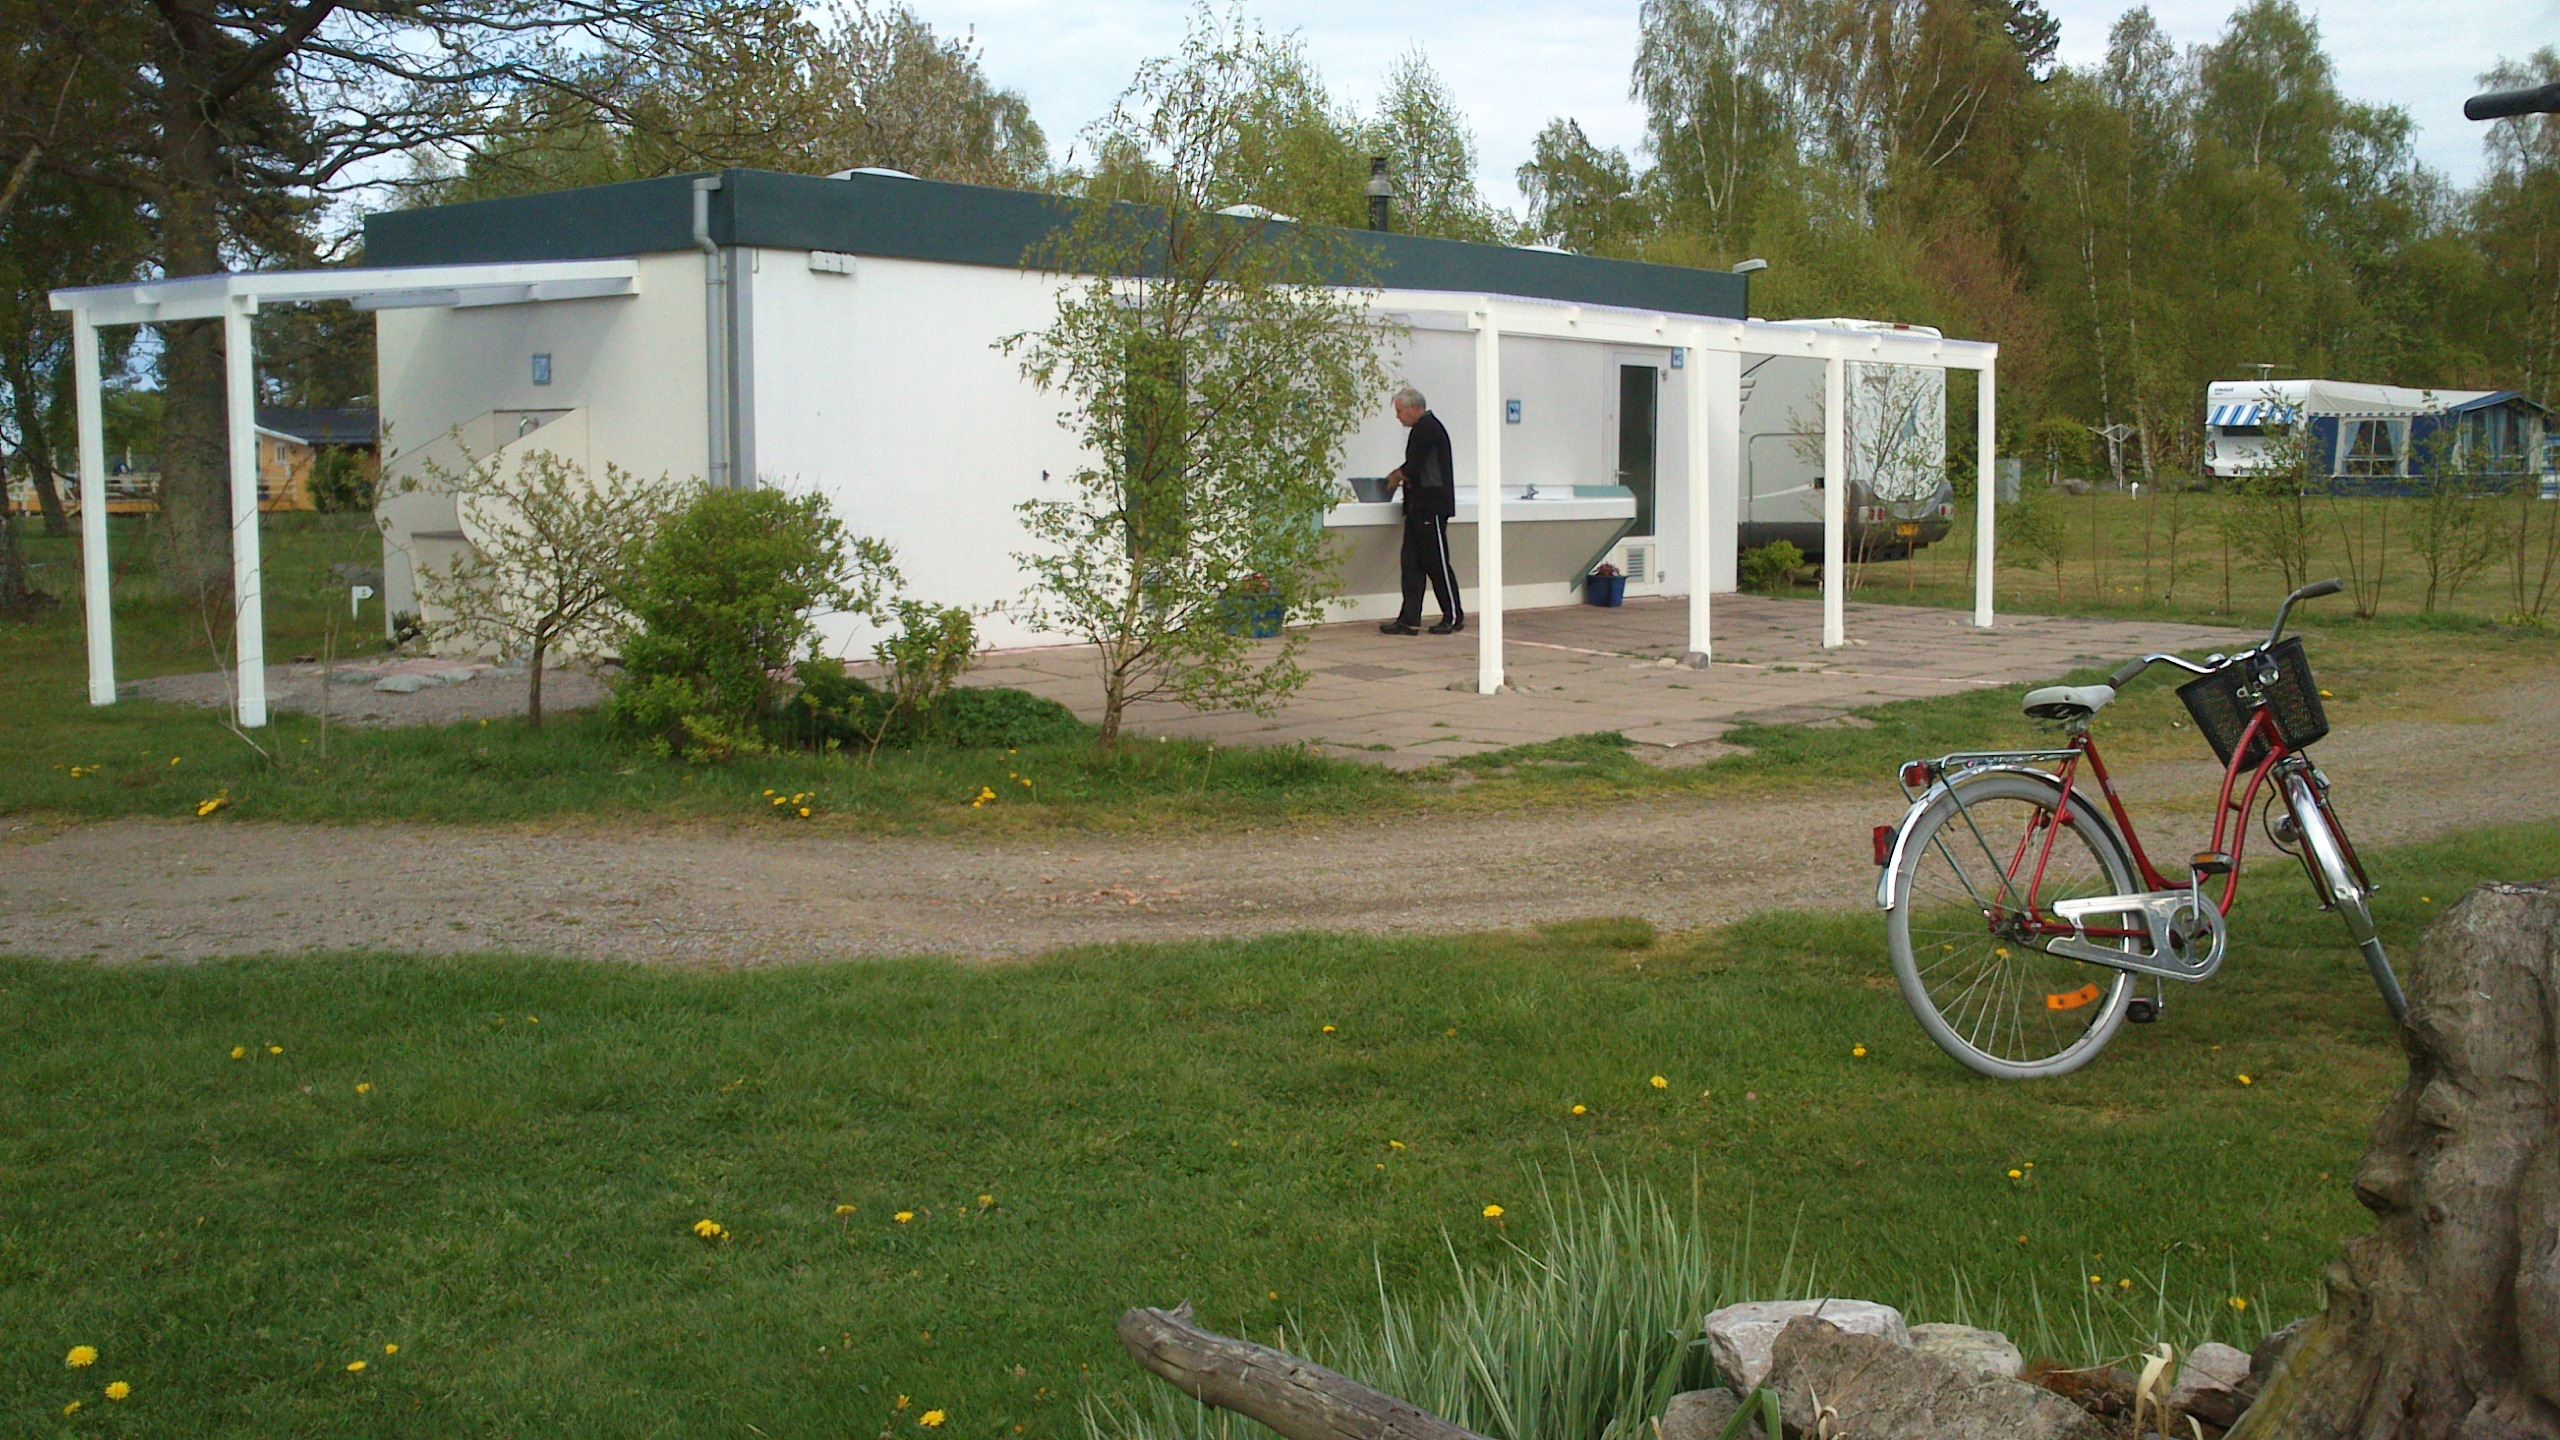 Skeppeviks Camping/Camping